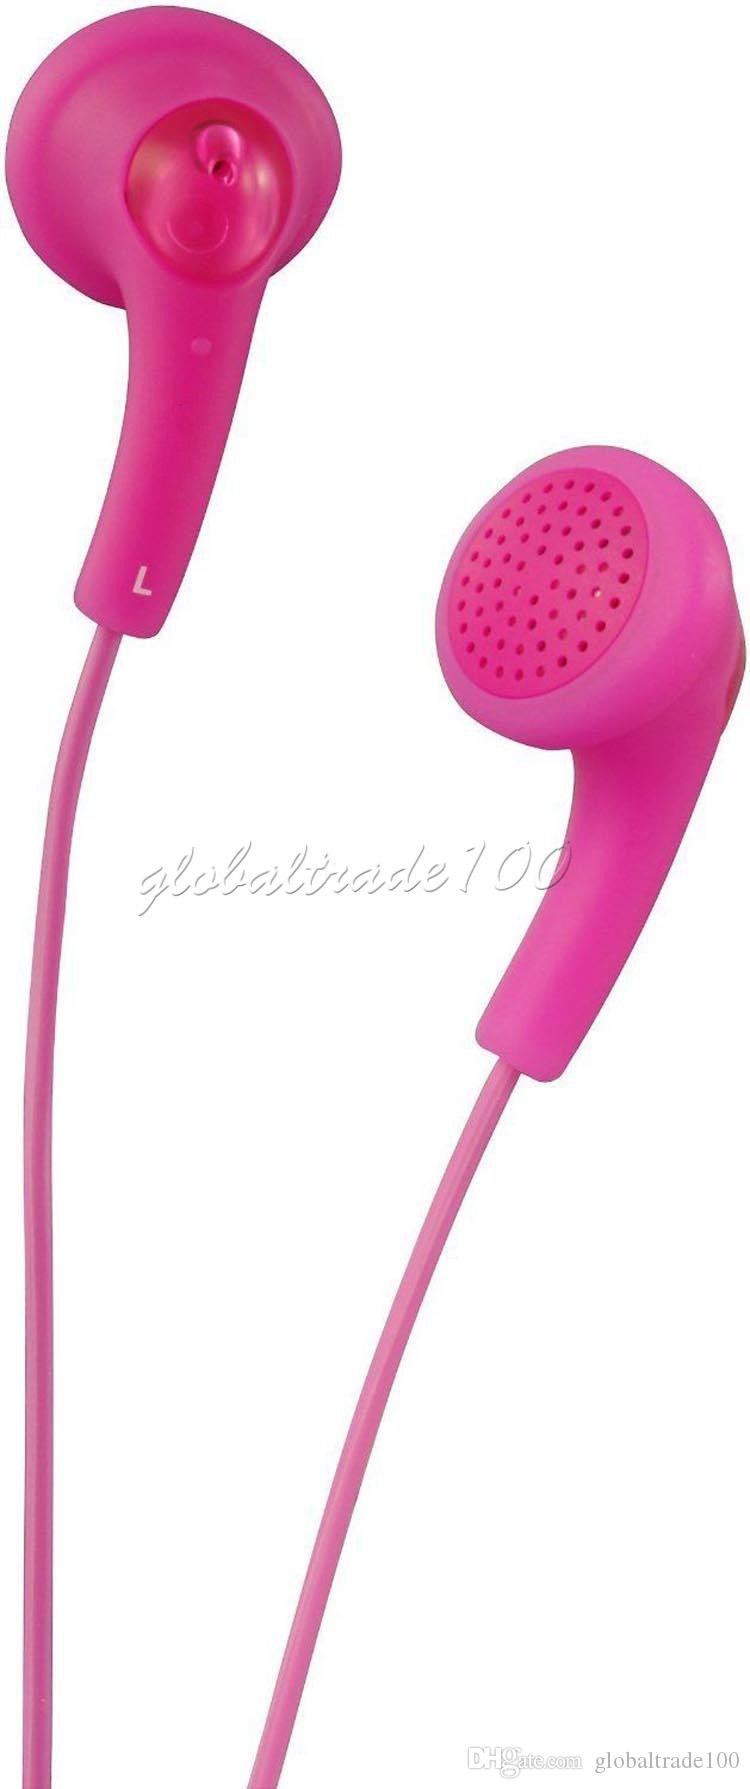 Gumy Gummy наушники HA F150 3,5 мм MP3 Наушники Наушники без микрофона красочные для iphone ipad ipod Samsung HTC